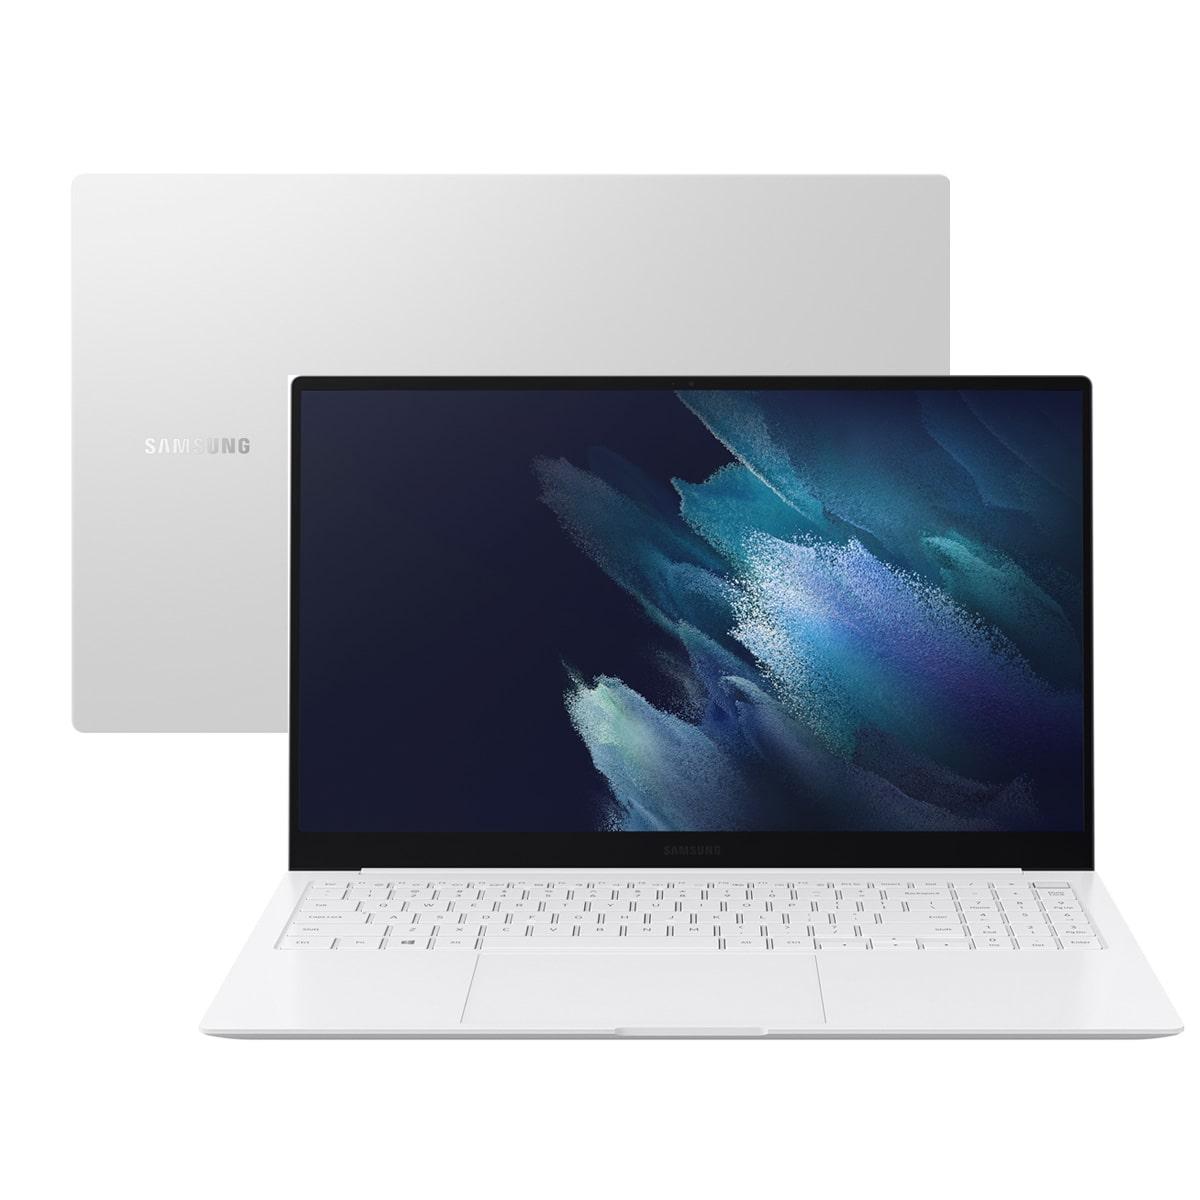 "Notebook - Samsung Np950xdb-ks1br I7-1165g7 2.80ghz 16gb 1tb Ssd Intel Iris Xe Graphics Windows 10 Home Galaxy Book Pro 15,6"" Polegadas"